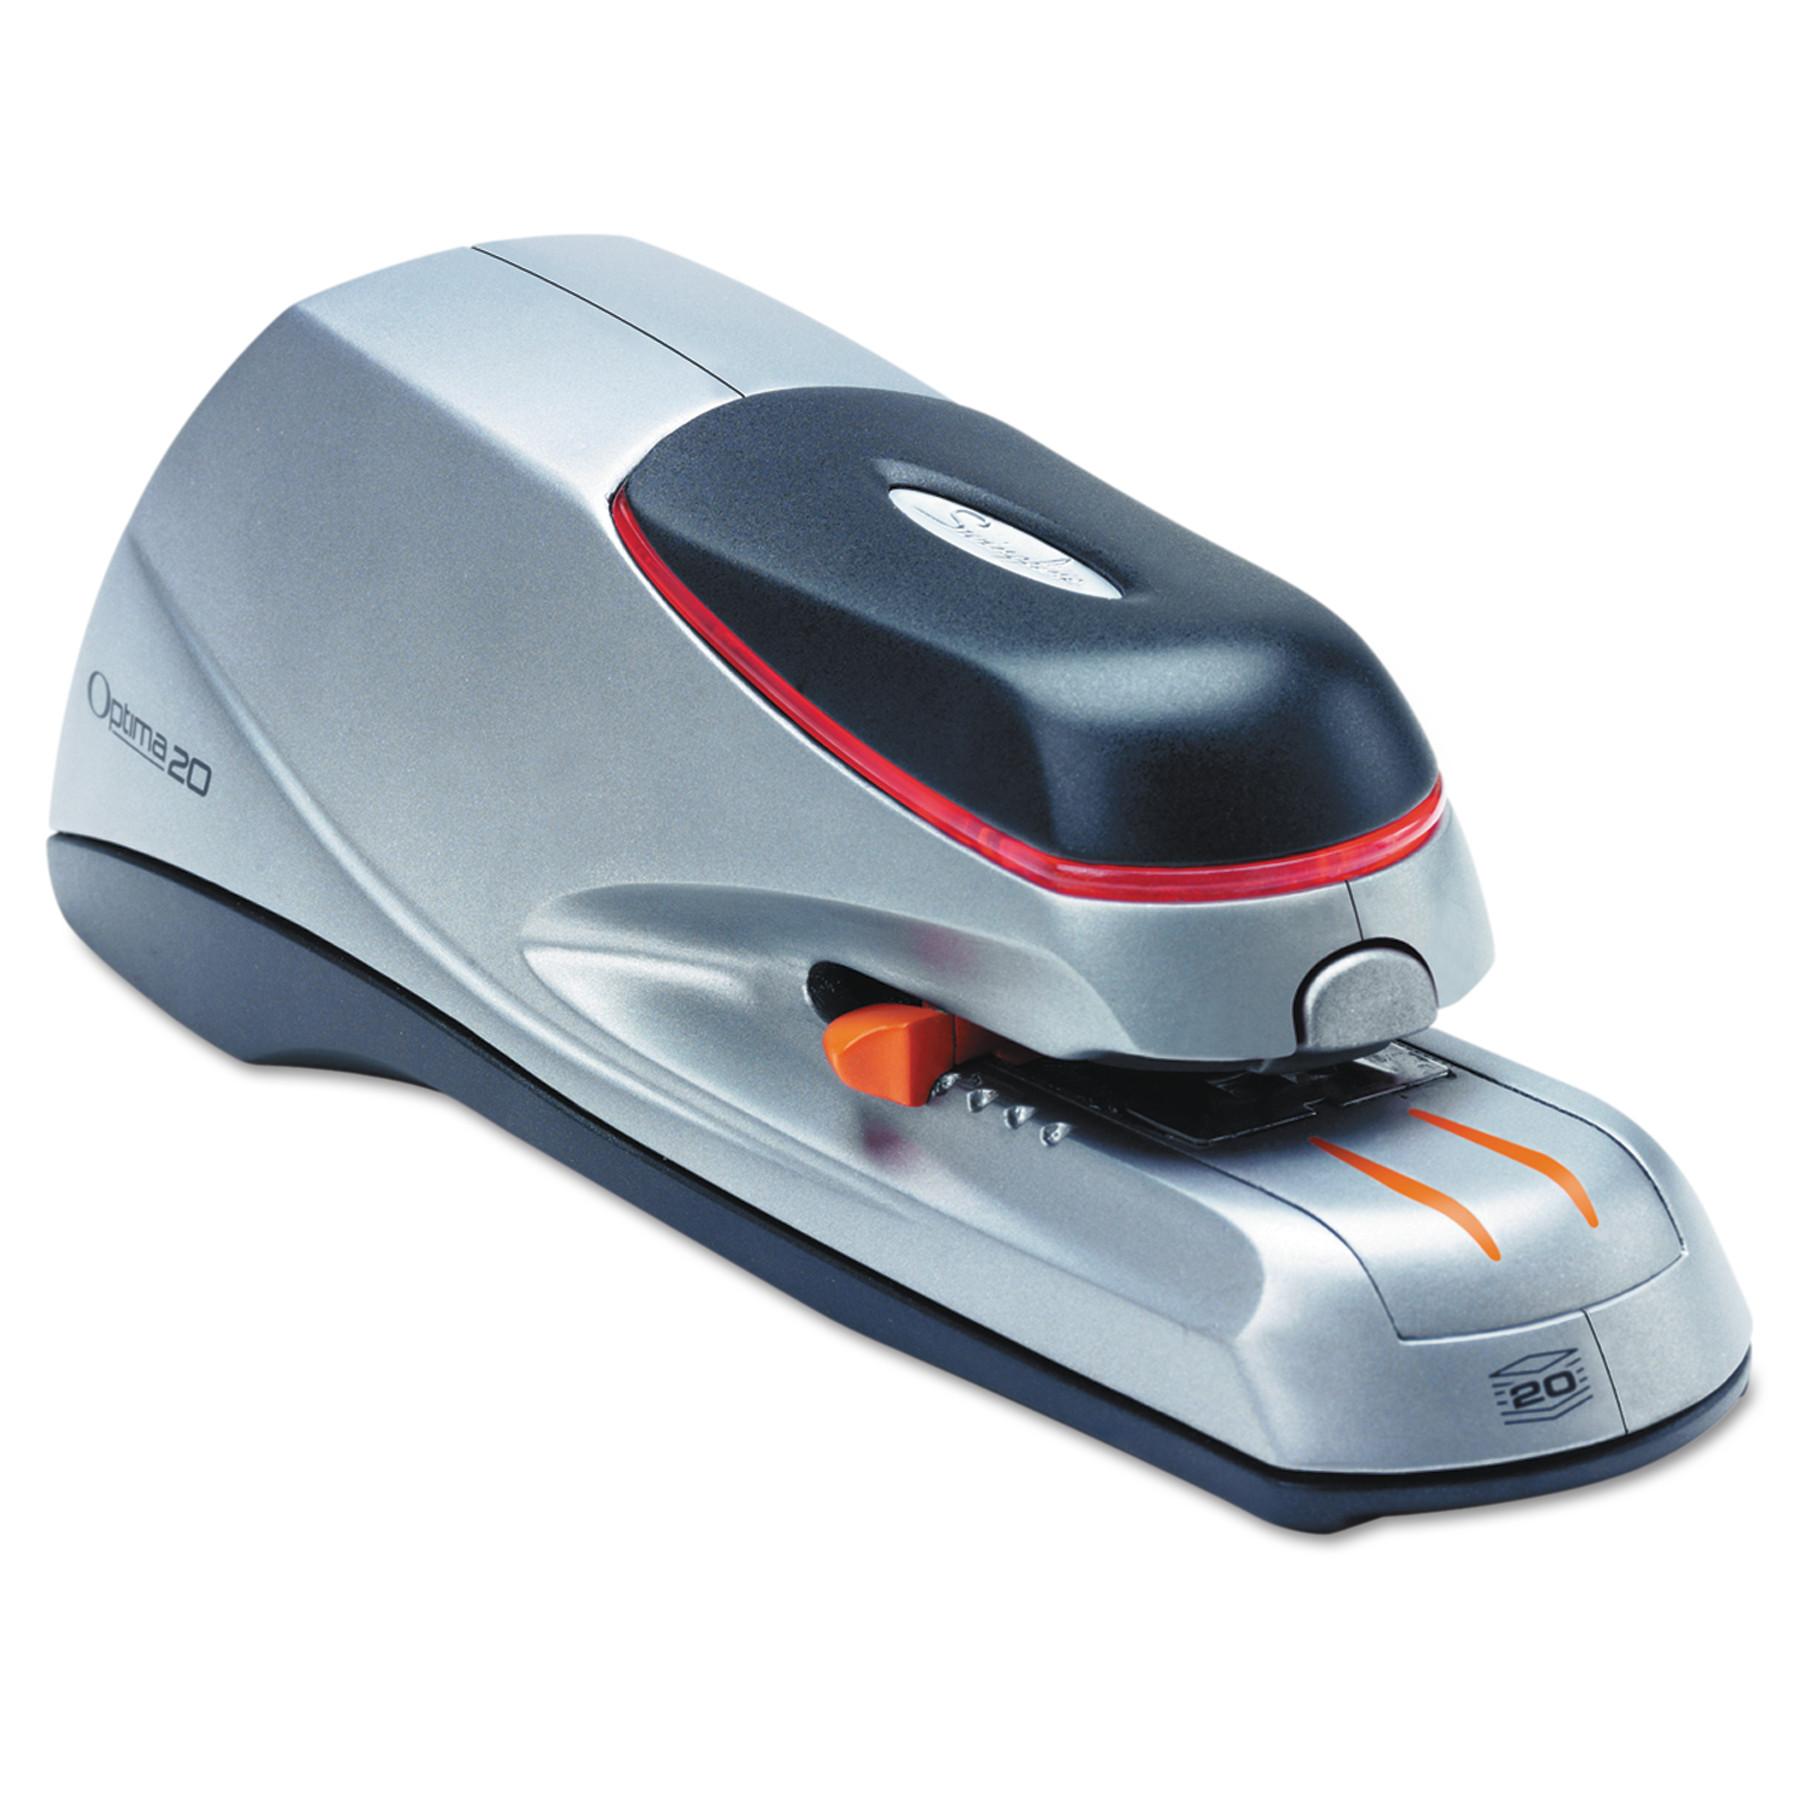 Swingline Optima 20 Electric Stapler, Desktop, Auto/Manual, 20 Sheets, Silver -SWI48208